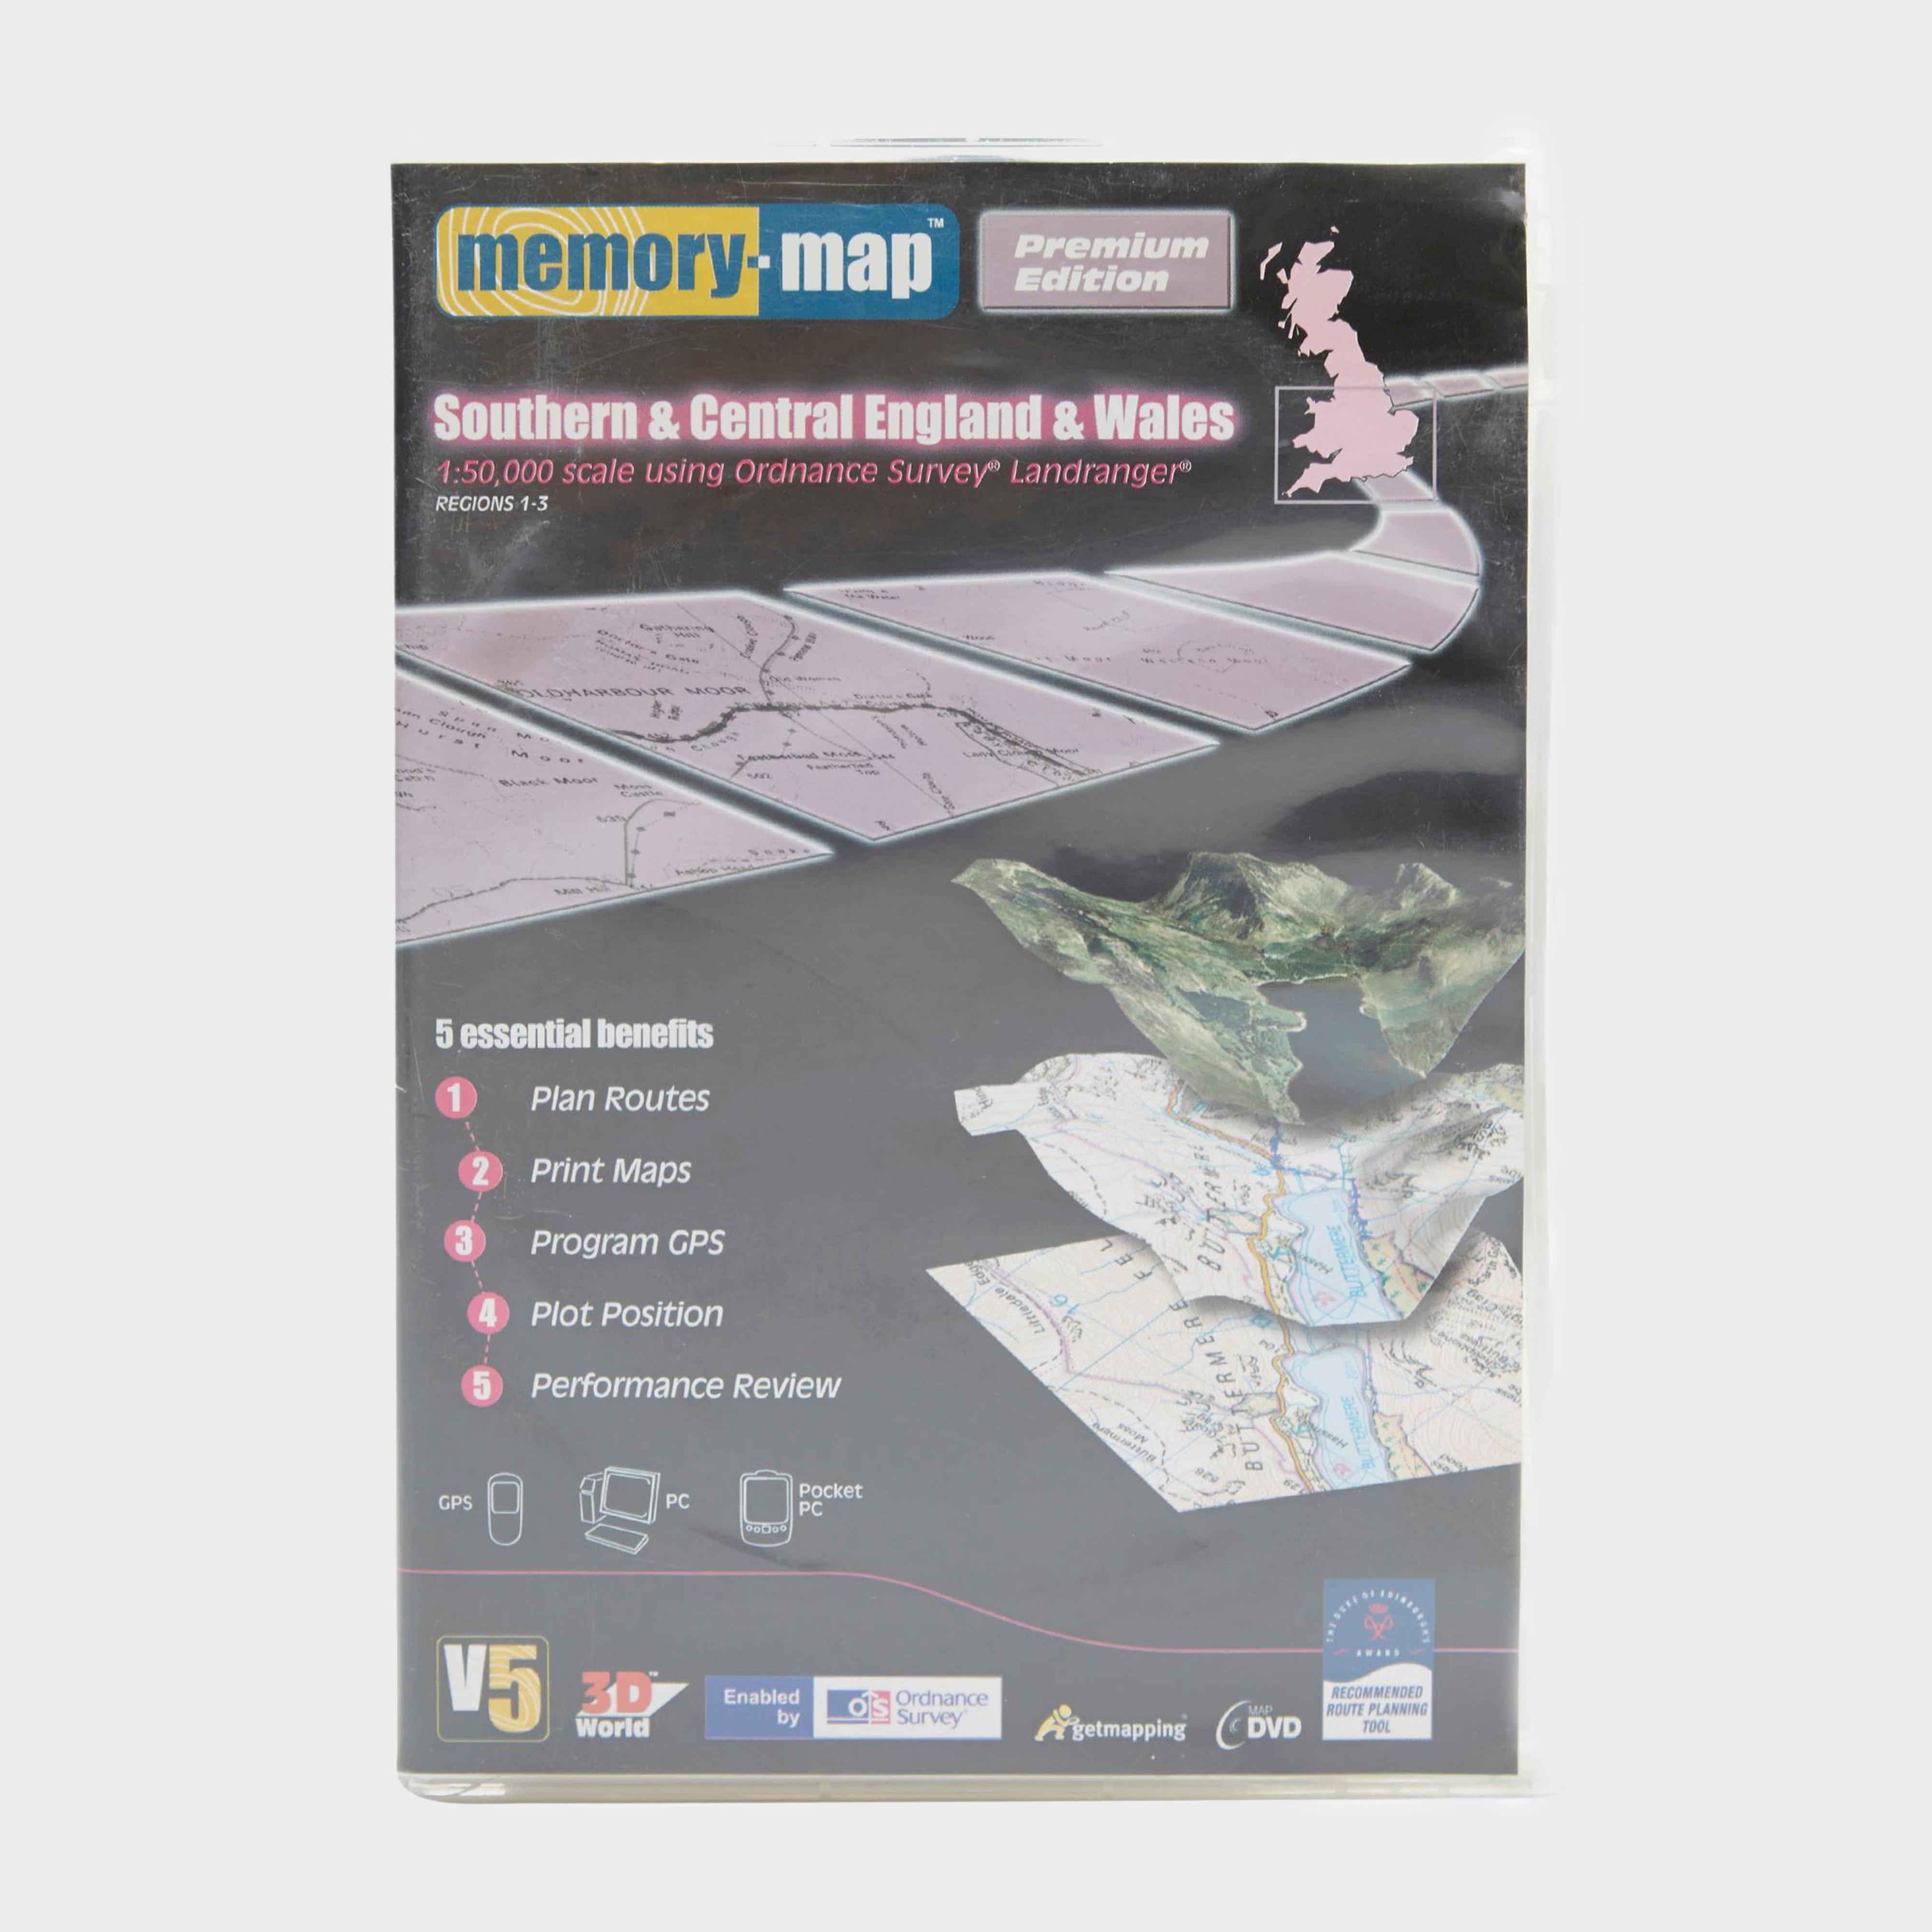 Memory Map Os Landranger Regions 1-3 - Southern & Central England & Wales - Multi/Assor, Multi/ASSOR